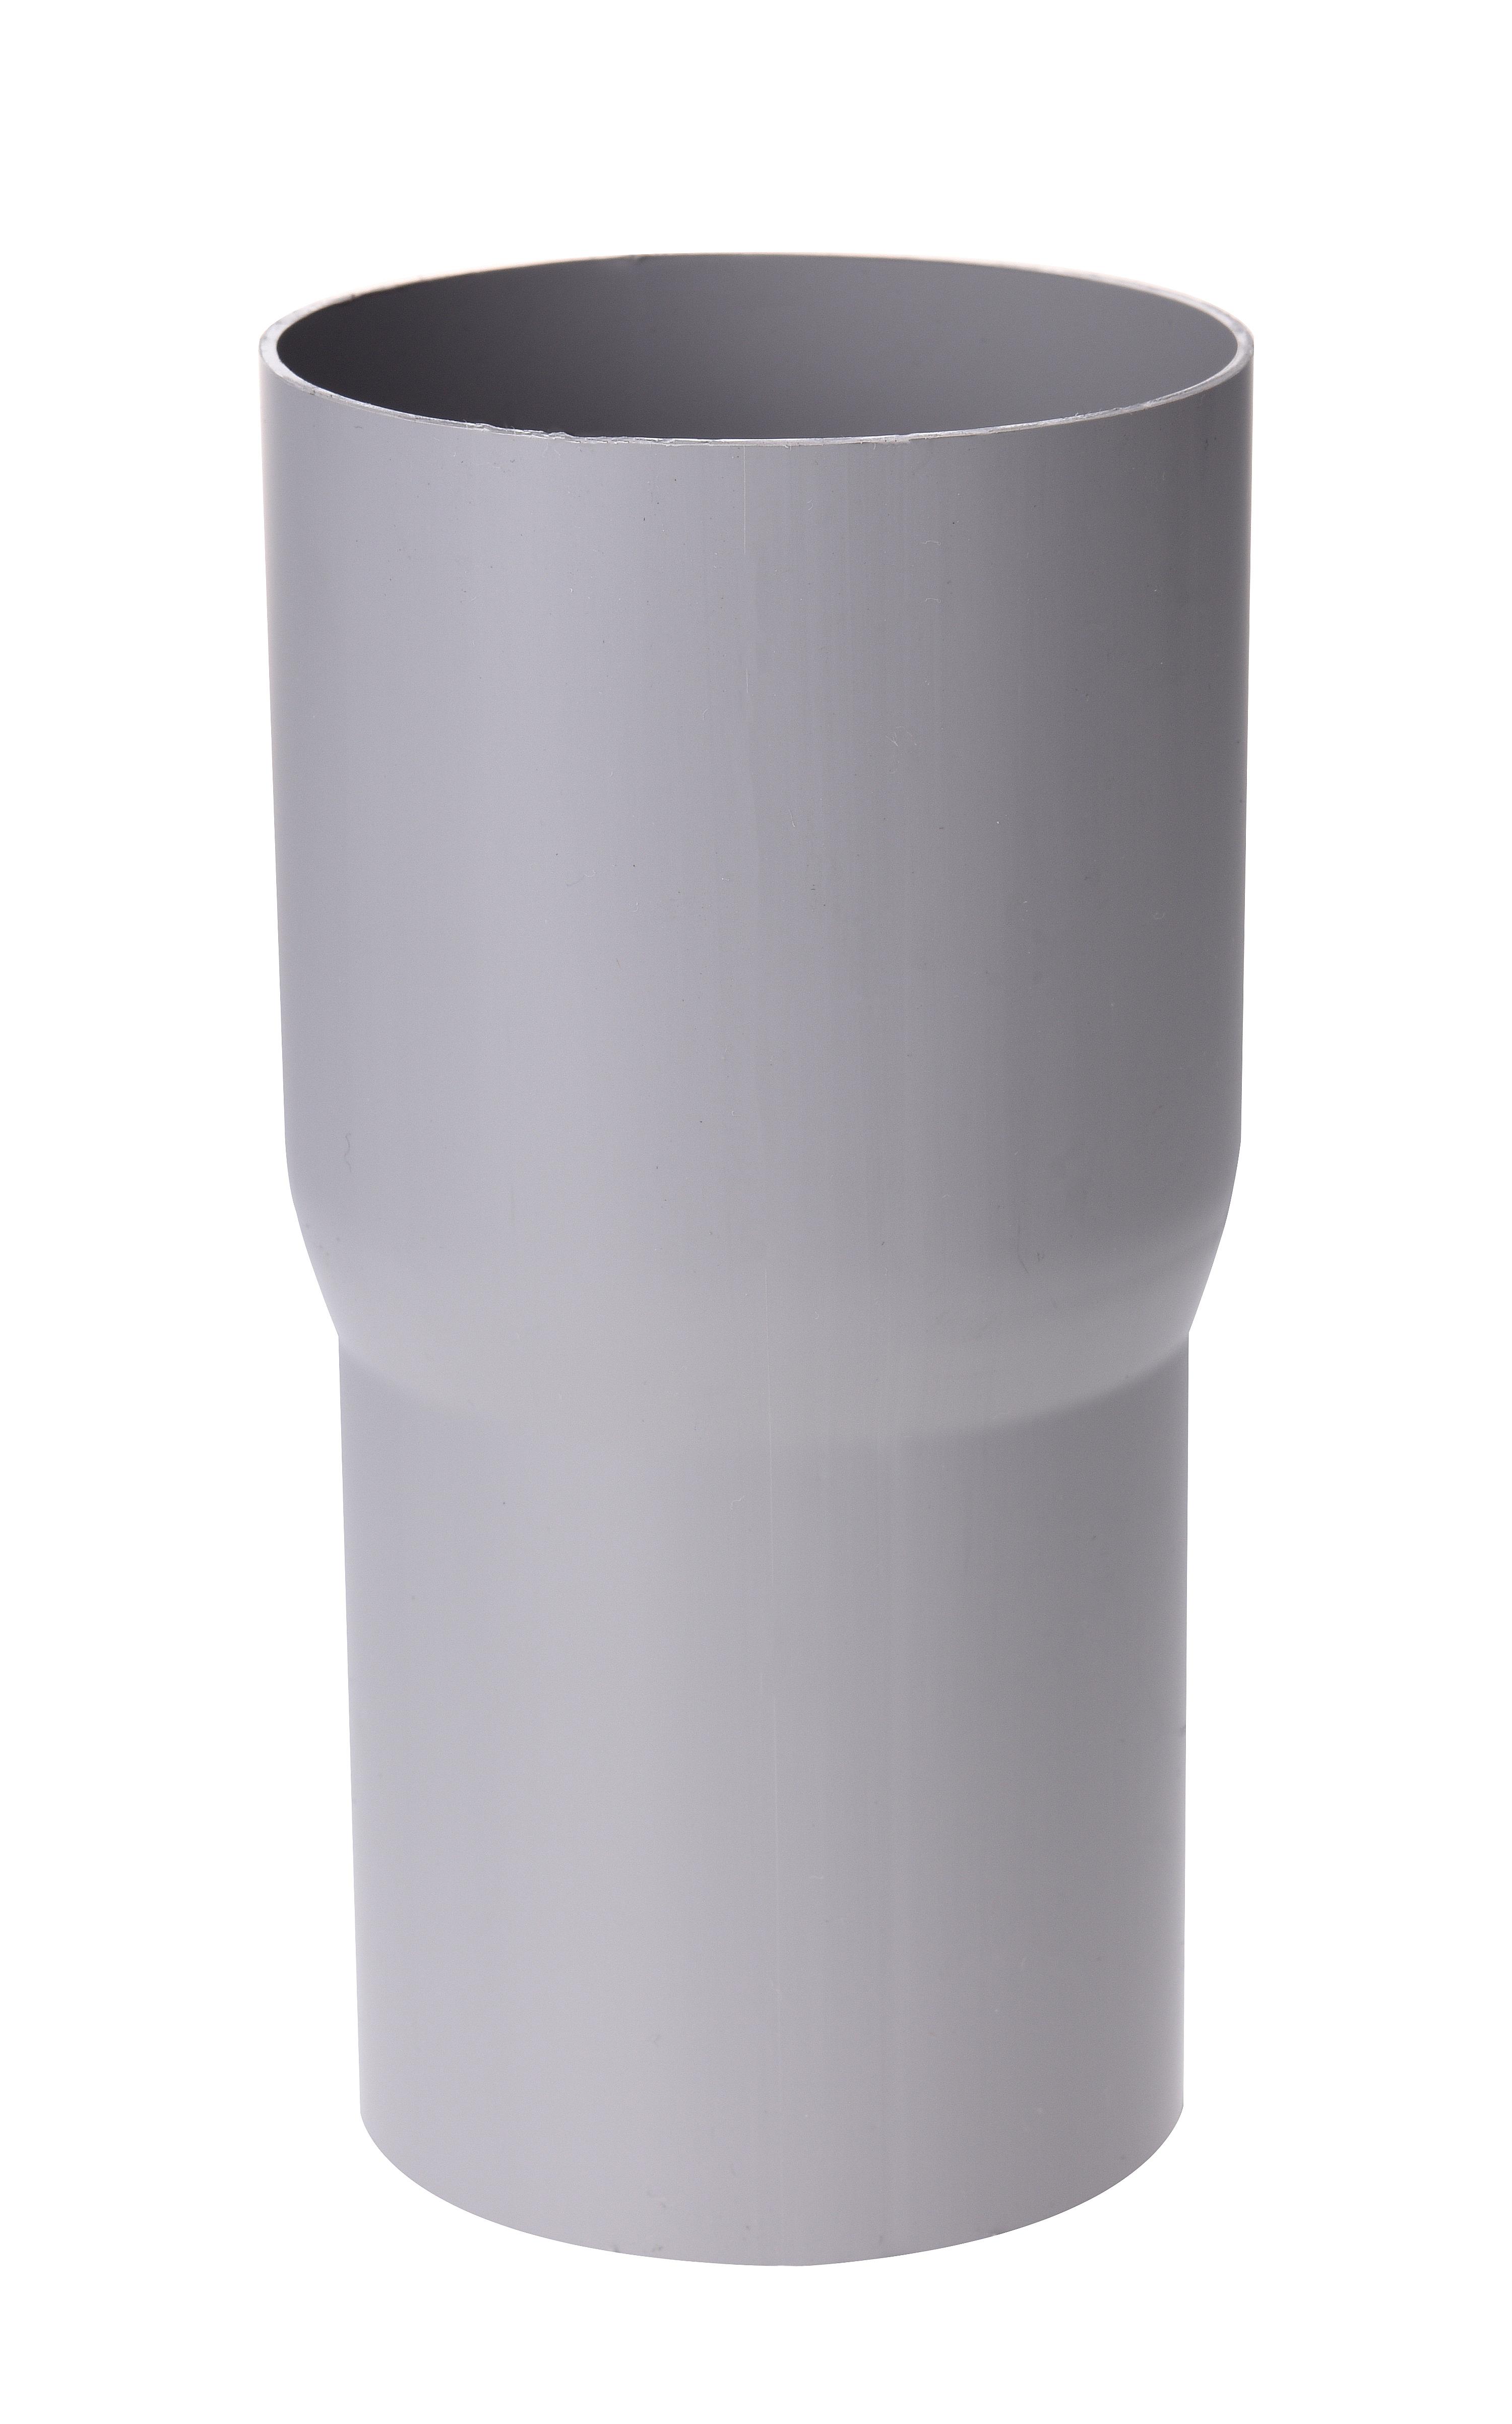 Tagrender - Plast - Grå - Nedløbsrør